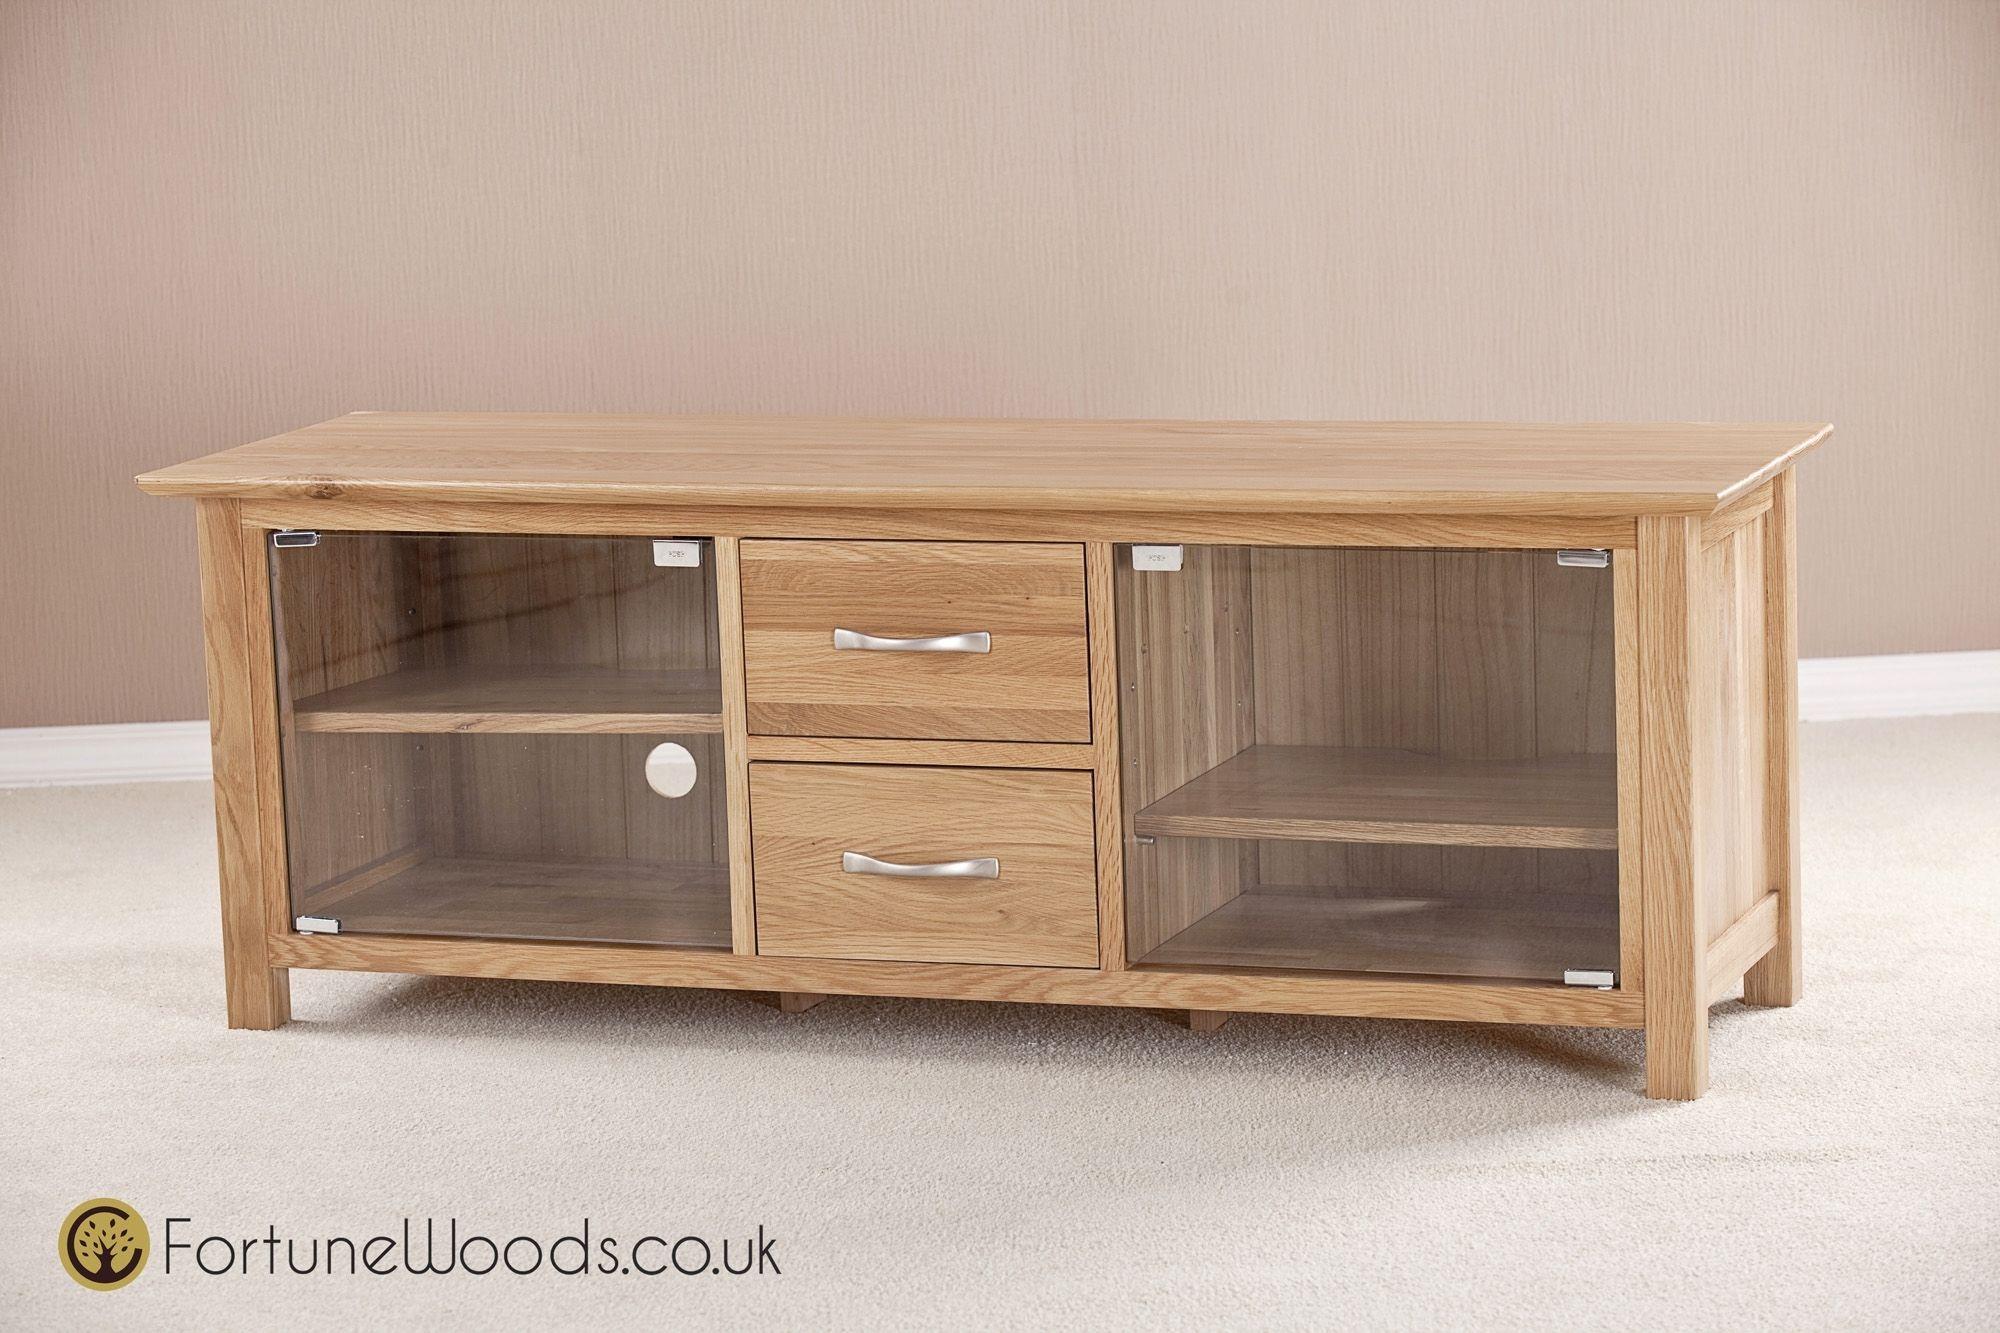 Oak Tv Cabinet With Glass Doors Http Betdaffaires Com